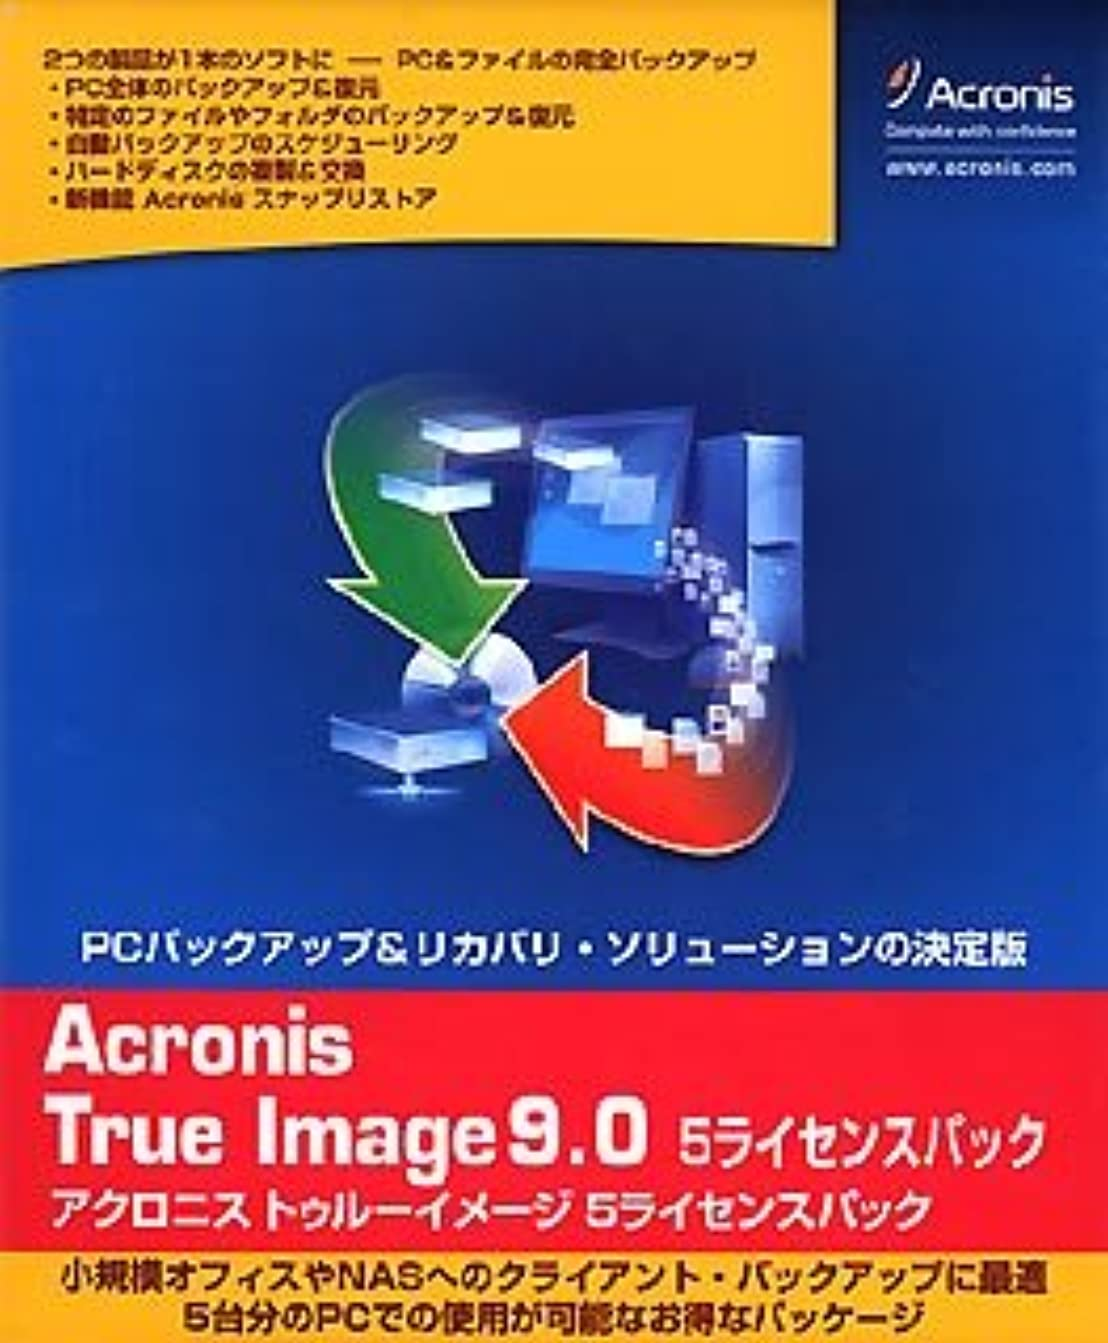 Acronis True Image 9.0 5ライセンスパック